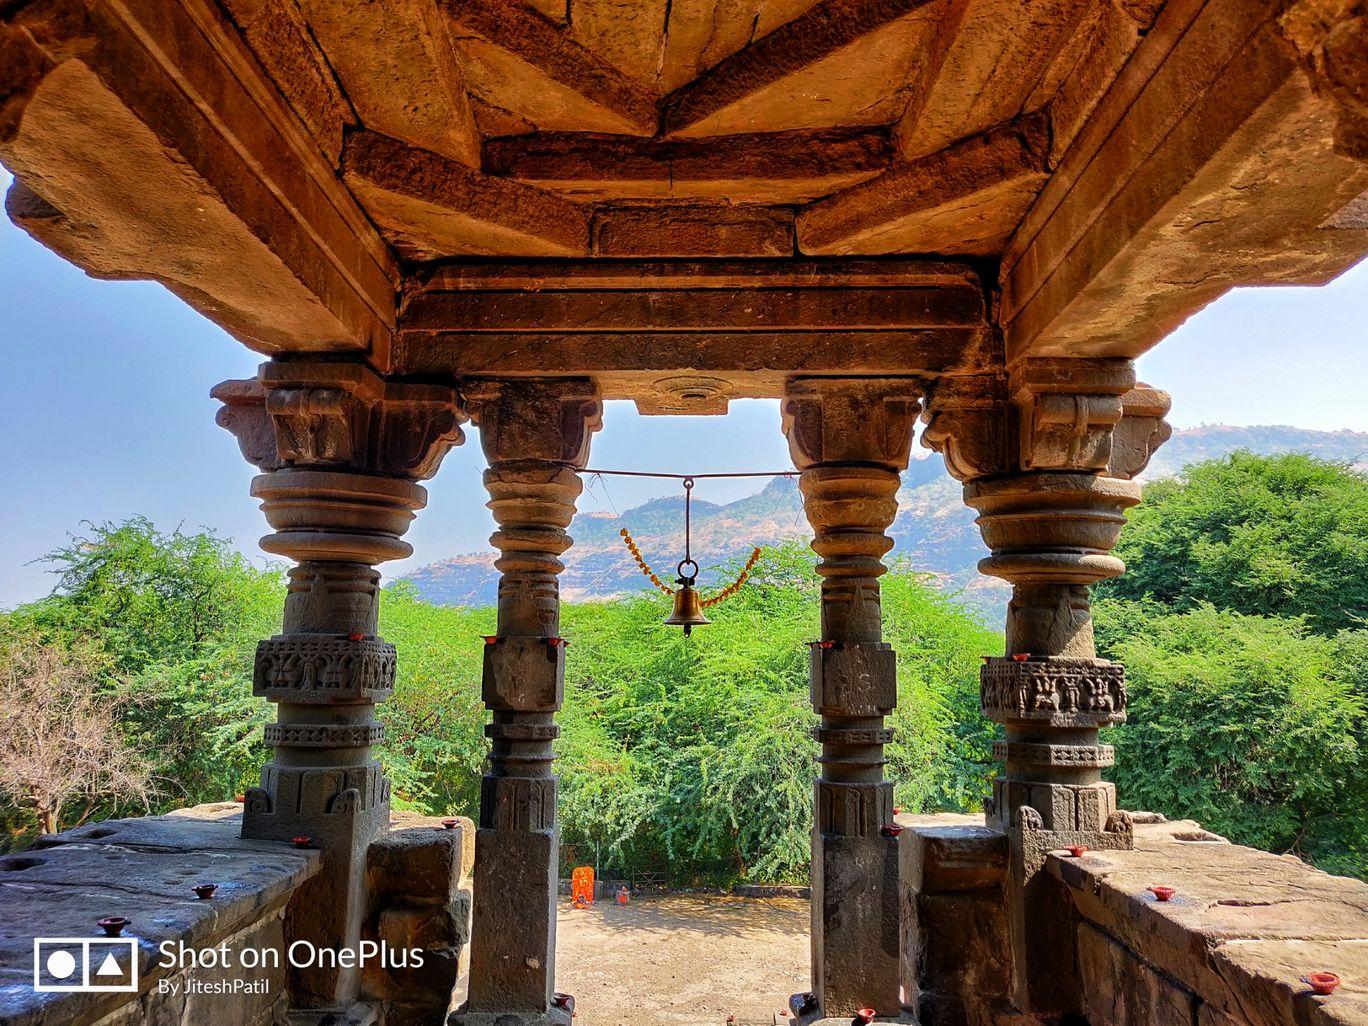 Photo of Patna Devi Mata Temple By Jitesh Patil